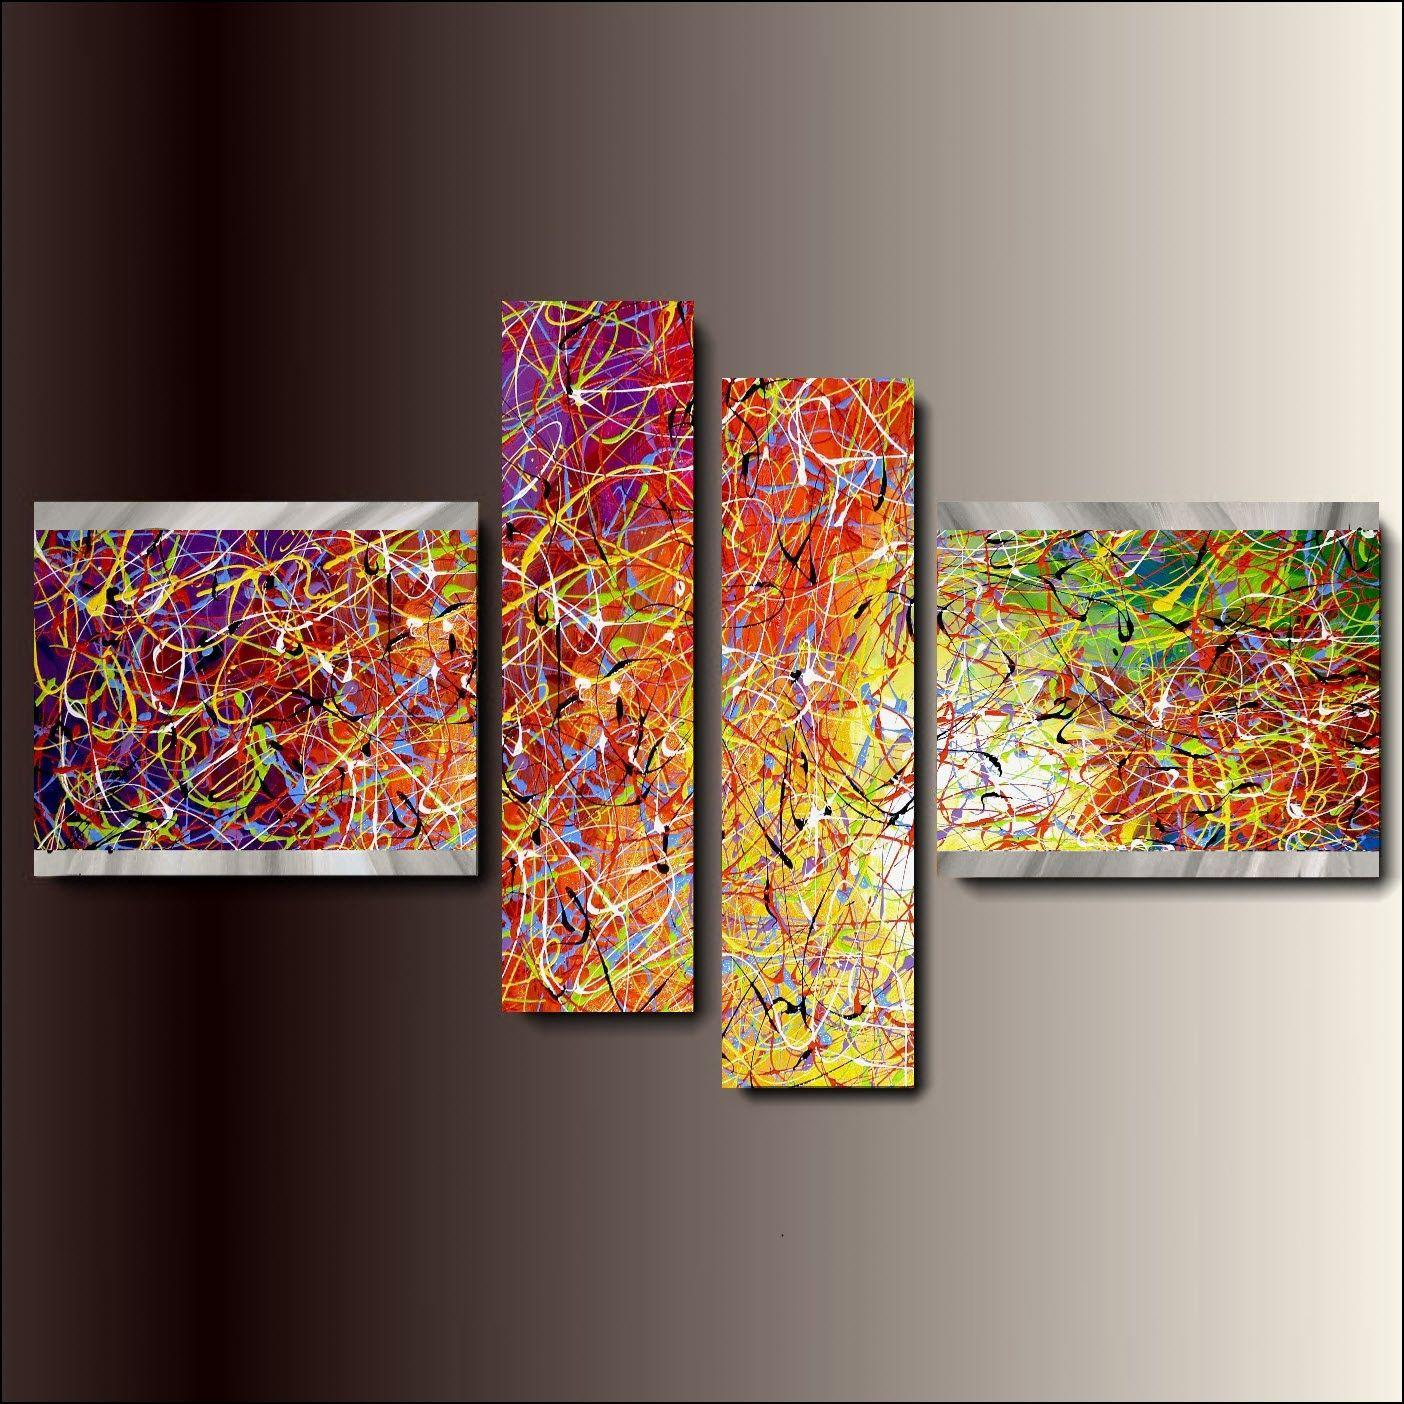 Grande dipinti astratti su tela hl36 pineglen for Dipinti a mano moderni